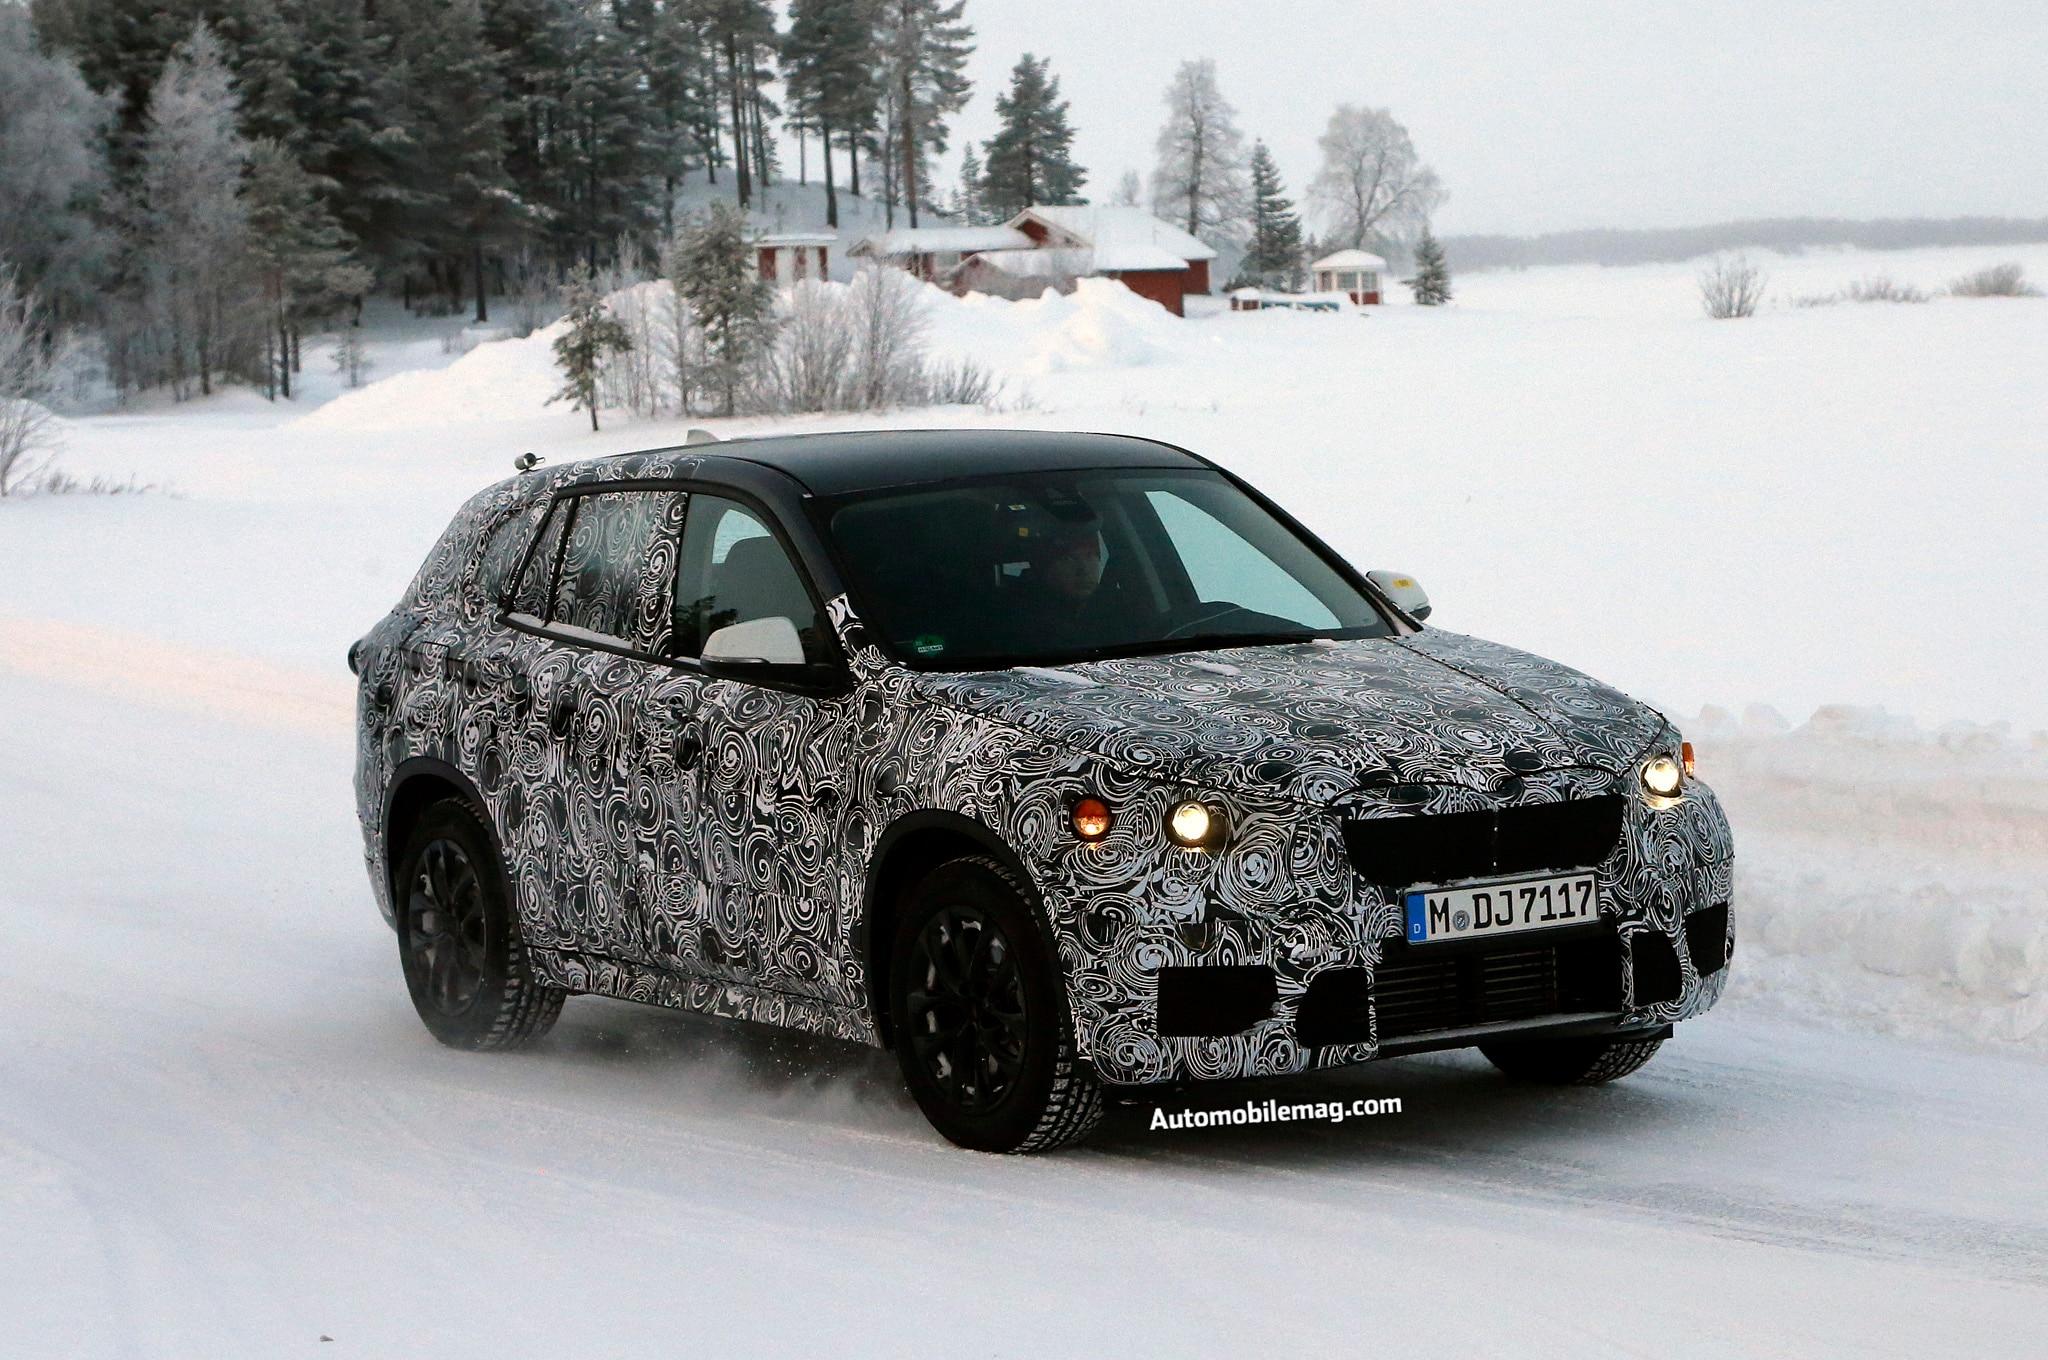 2016 BMW X1 Spy Shot Front Three Quarter 21